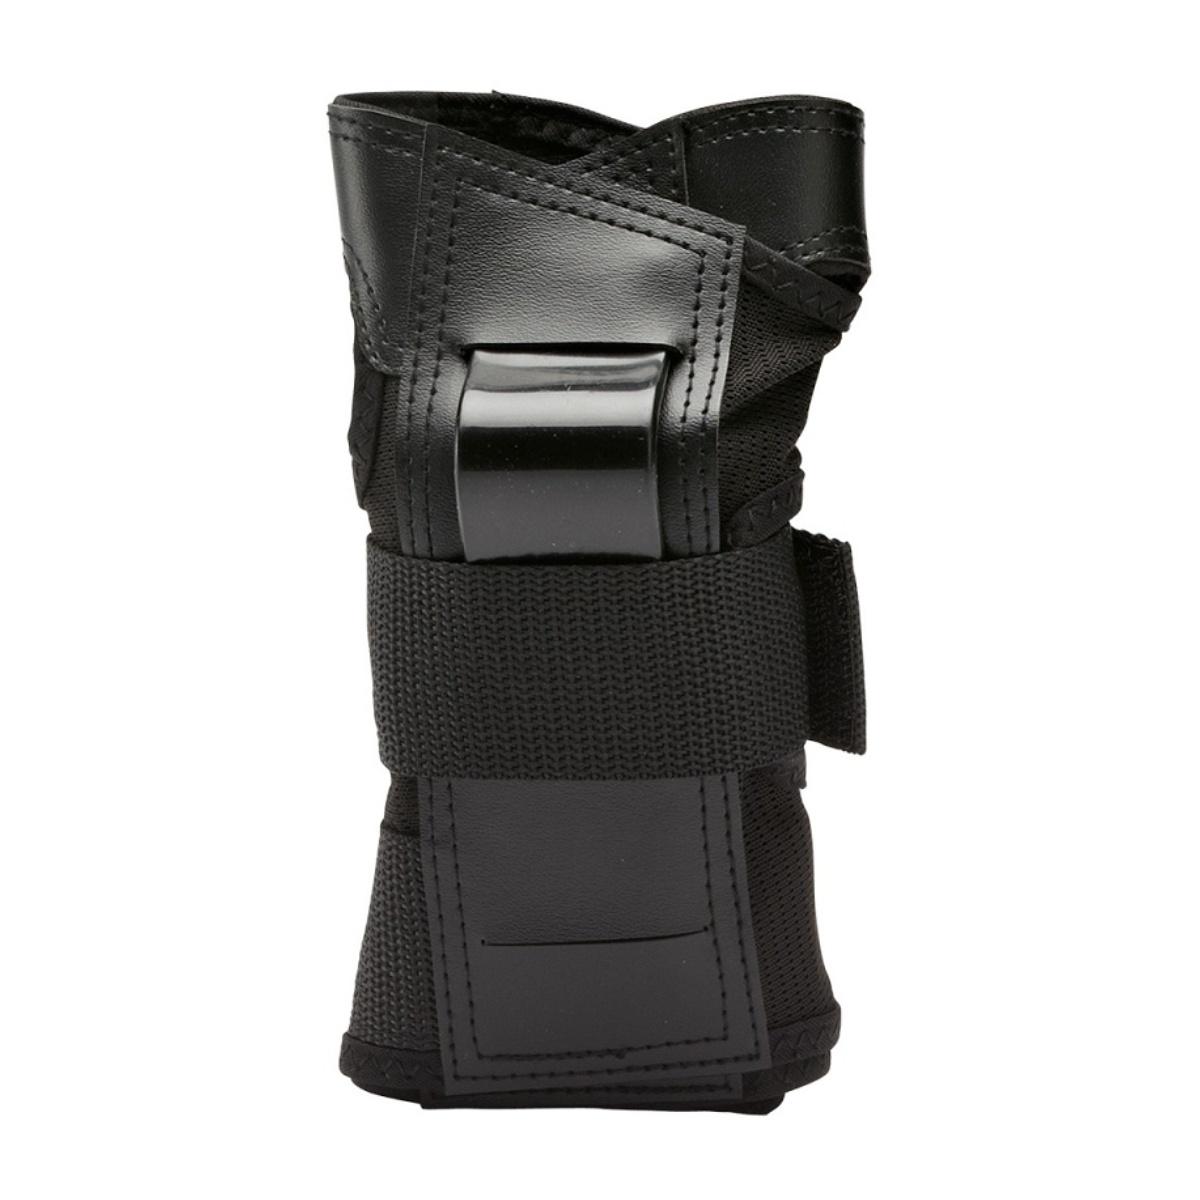 Chrániče K2 Prime M Wrist Guard - vel. L